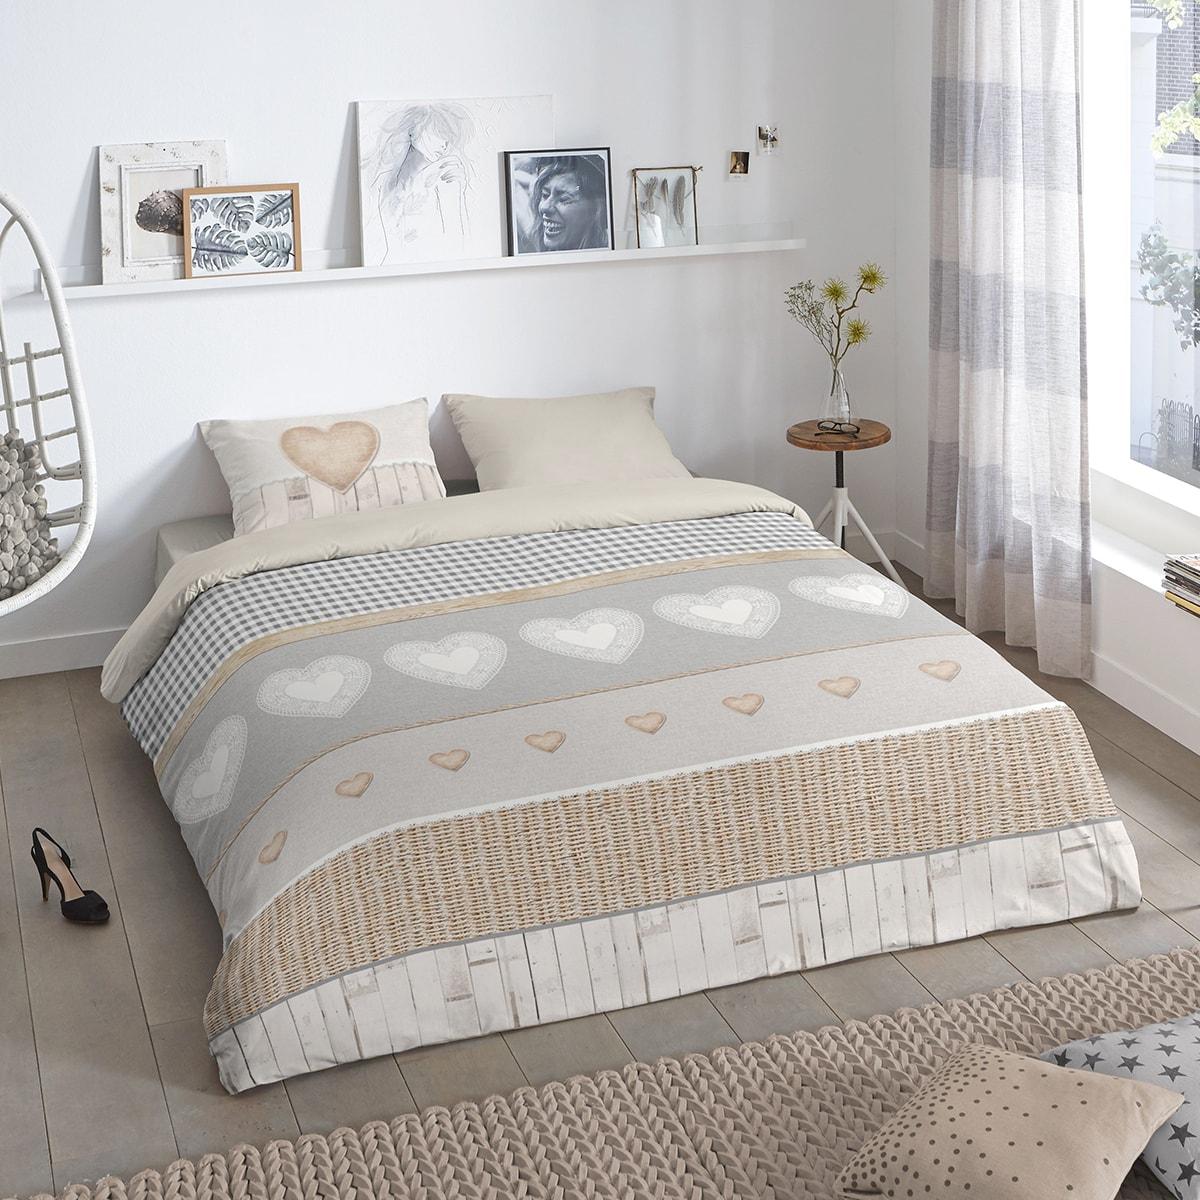 good morning flanell bettw sche herzen g nstig online kaufen bei bettwaren shop. Black Bedroom Furniture Sets. Home Design Ideas